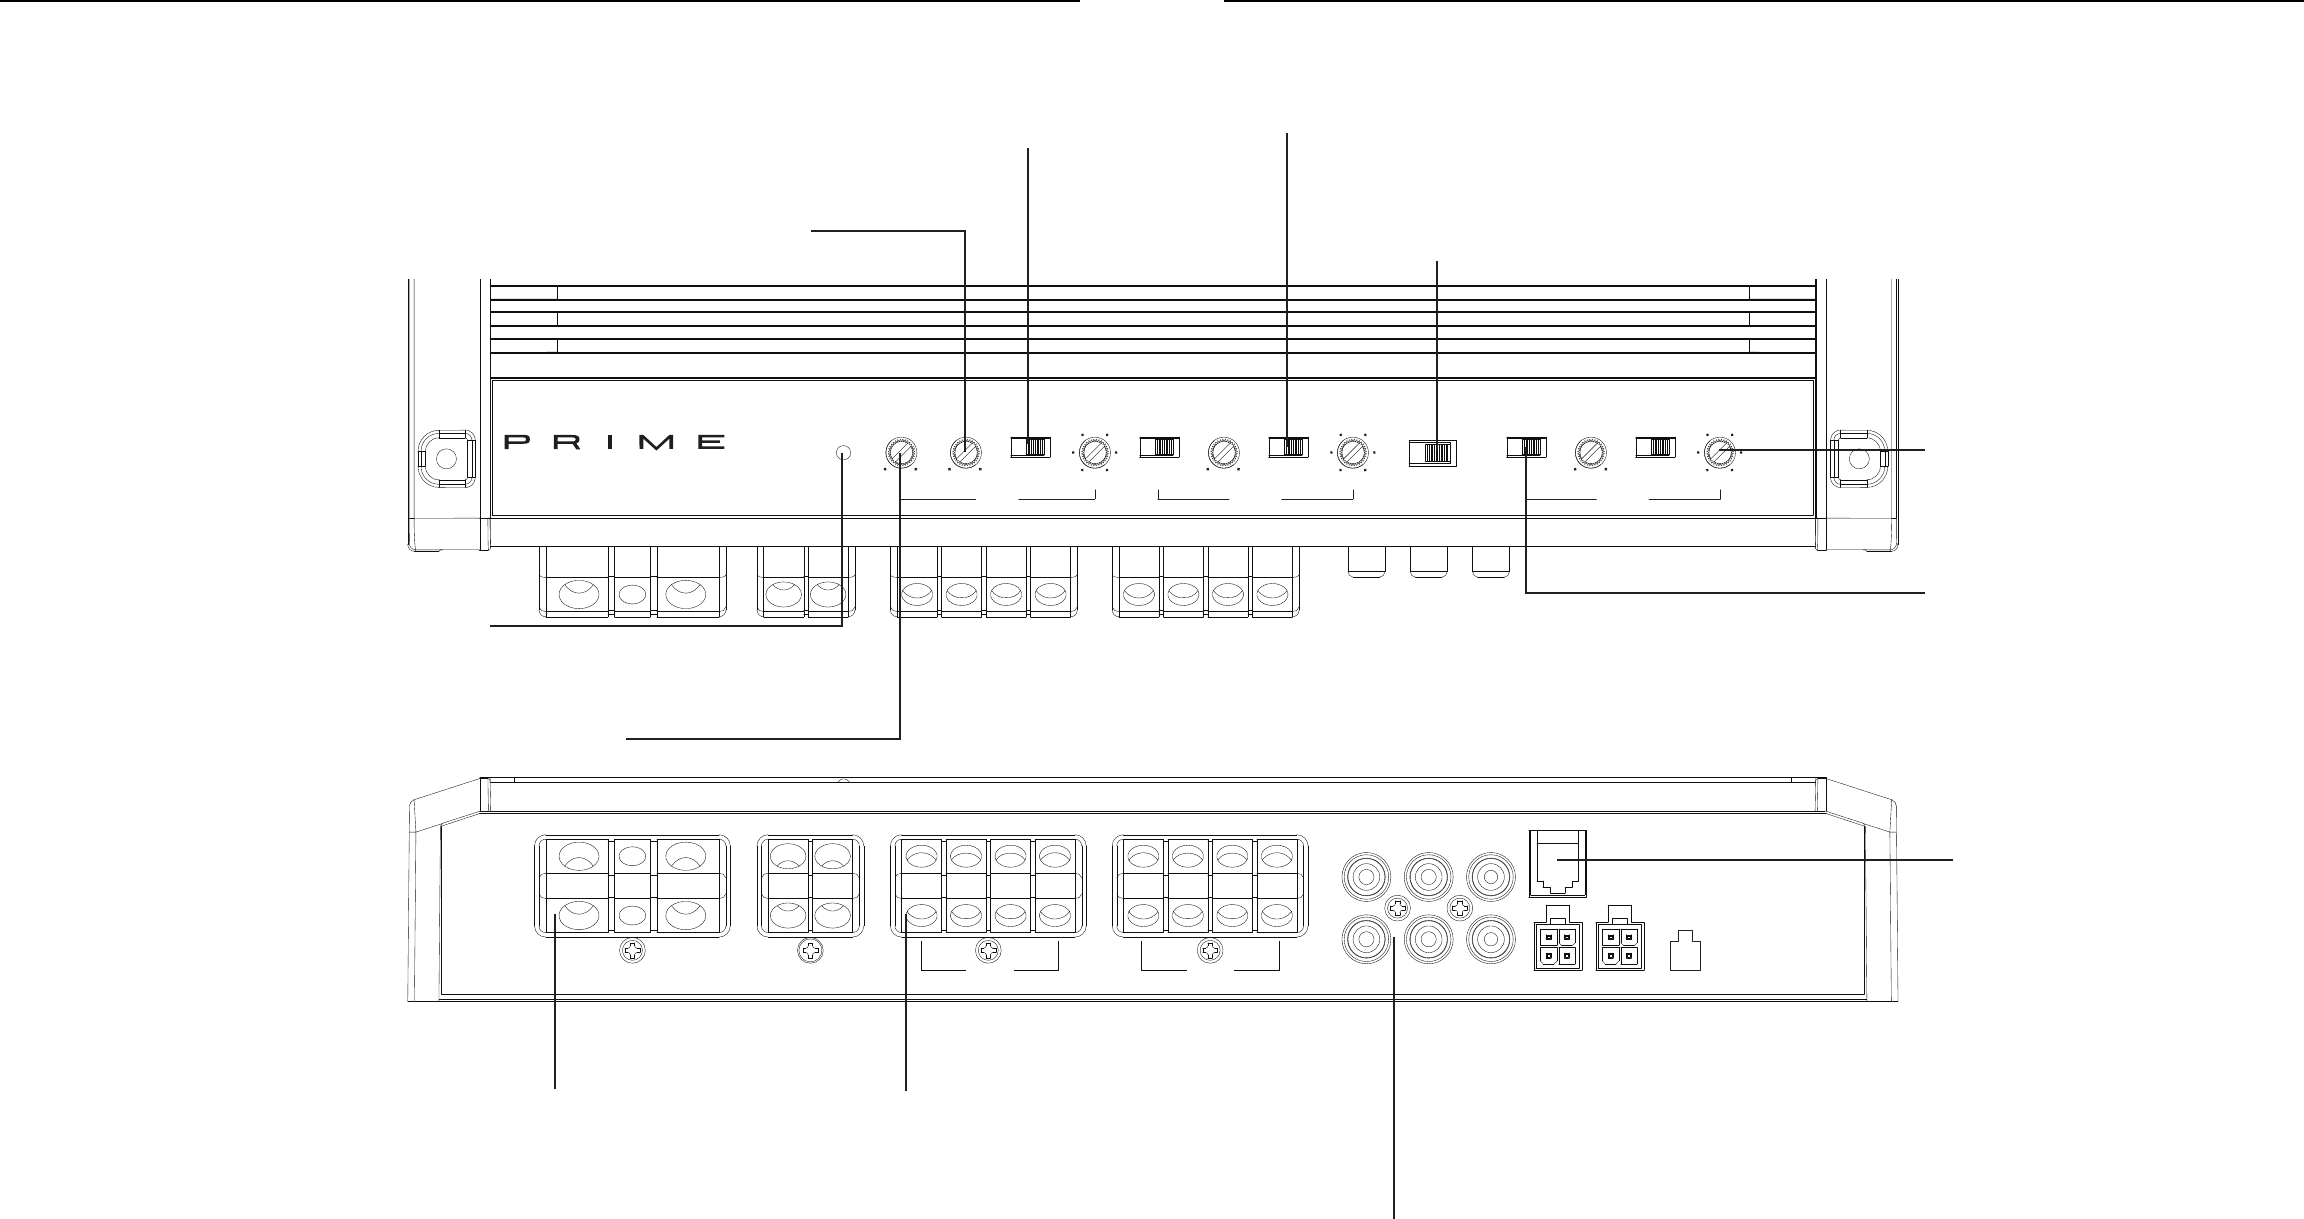 Handleiding Rockford Fosgate R150X2 (pagina 1 van 15) (English)